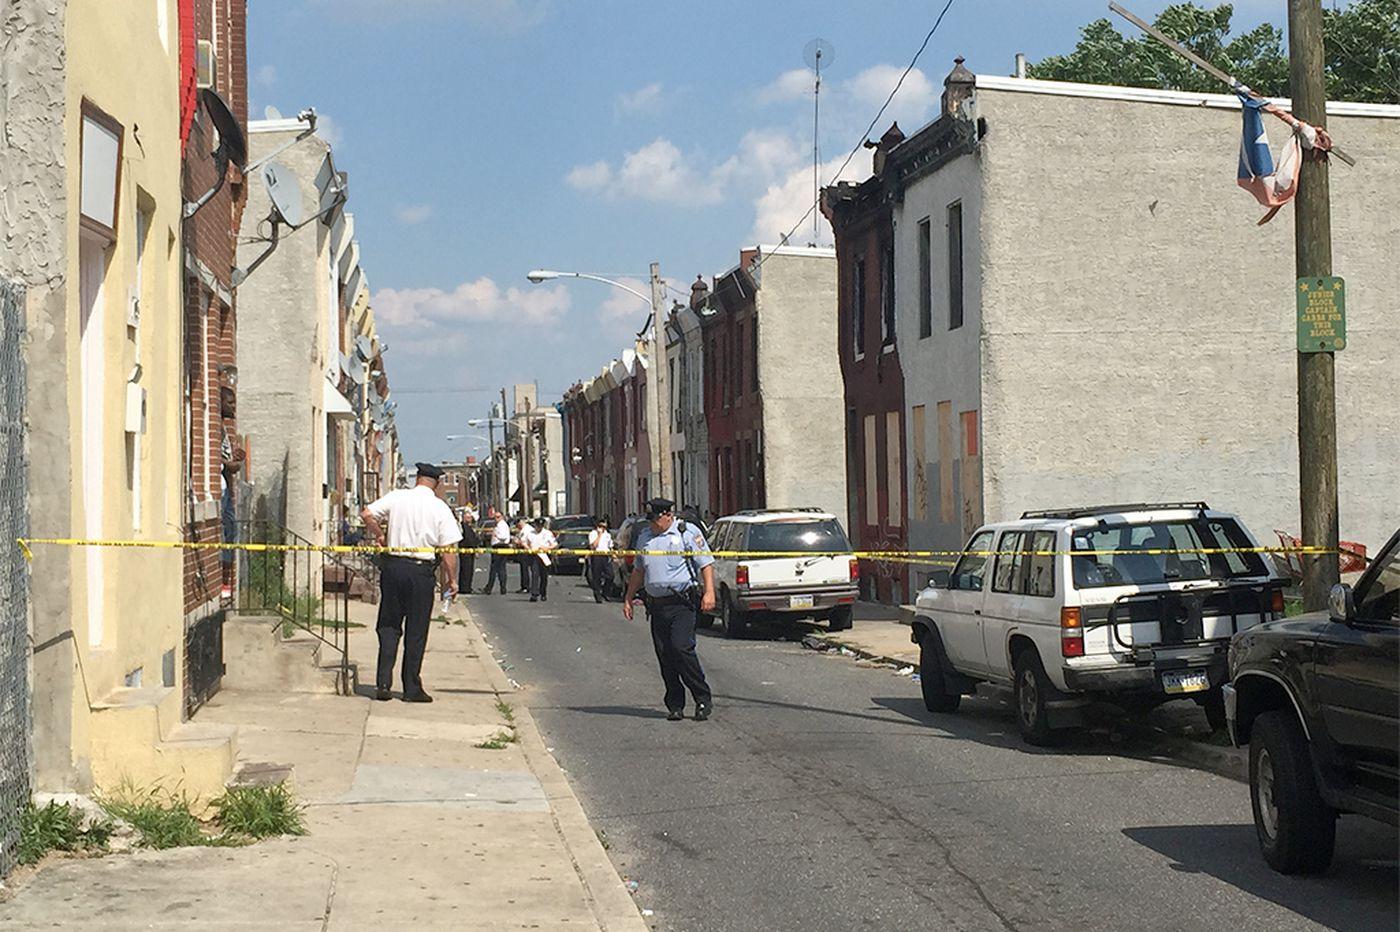 Seven people shot in Kensington